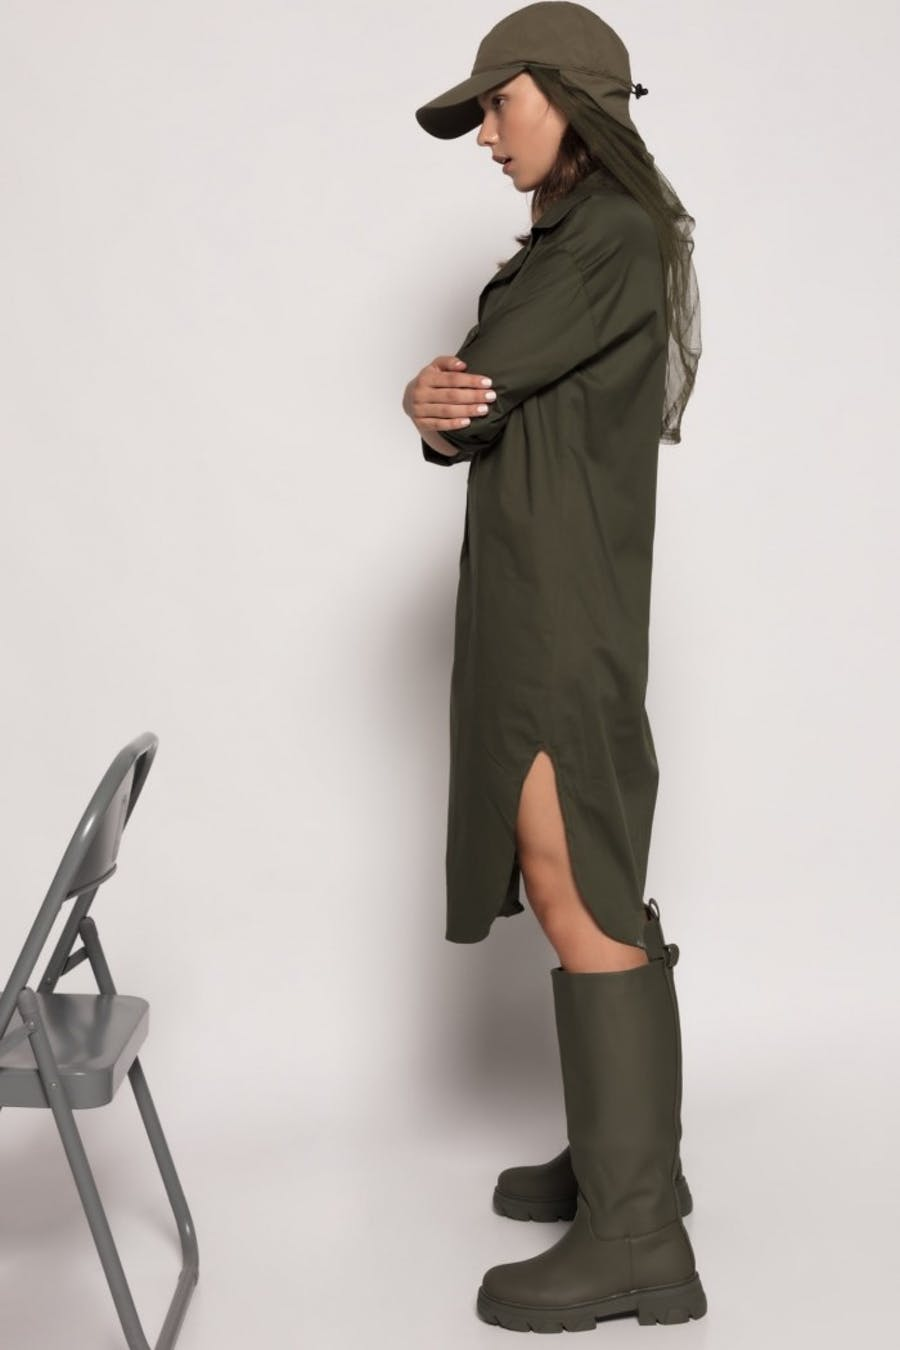 Vestido Cassual camisero Verde